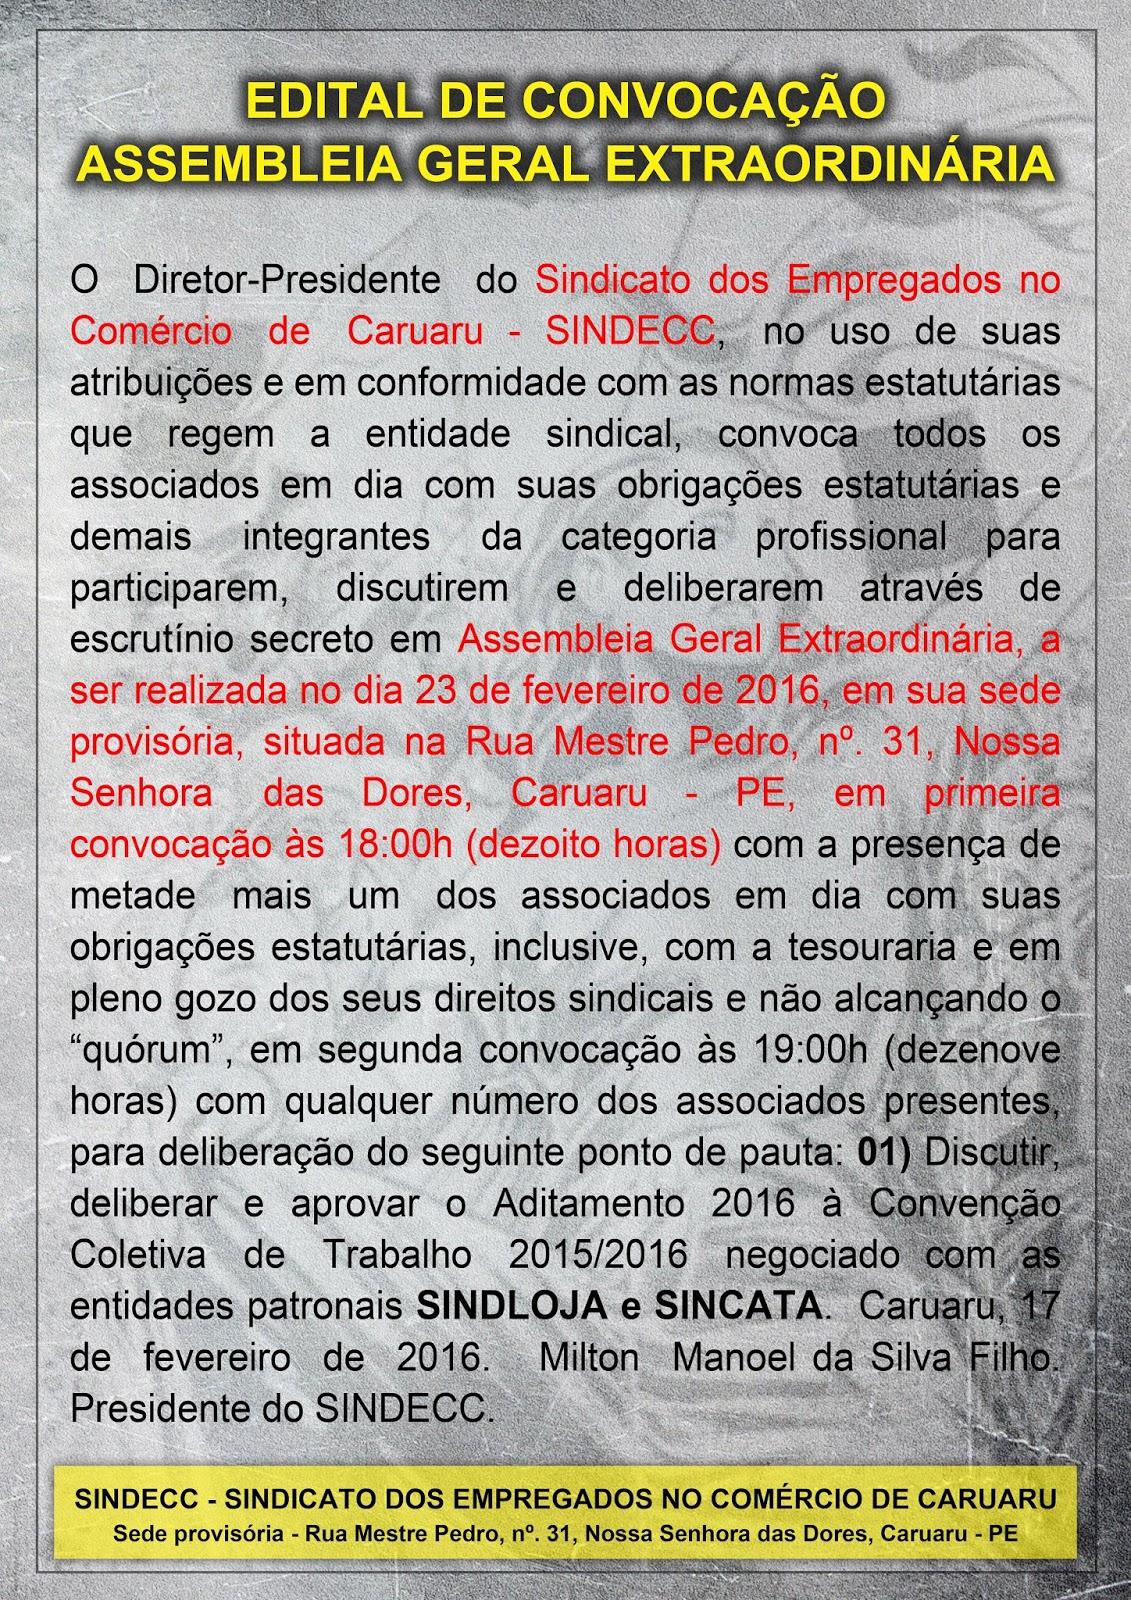 edital-de-convocacao-assembleia-geral-extraordinaria